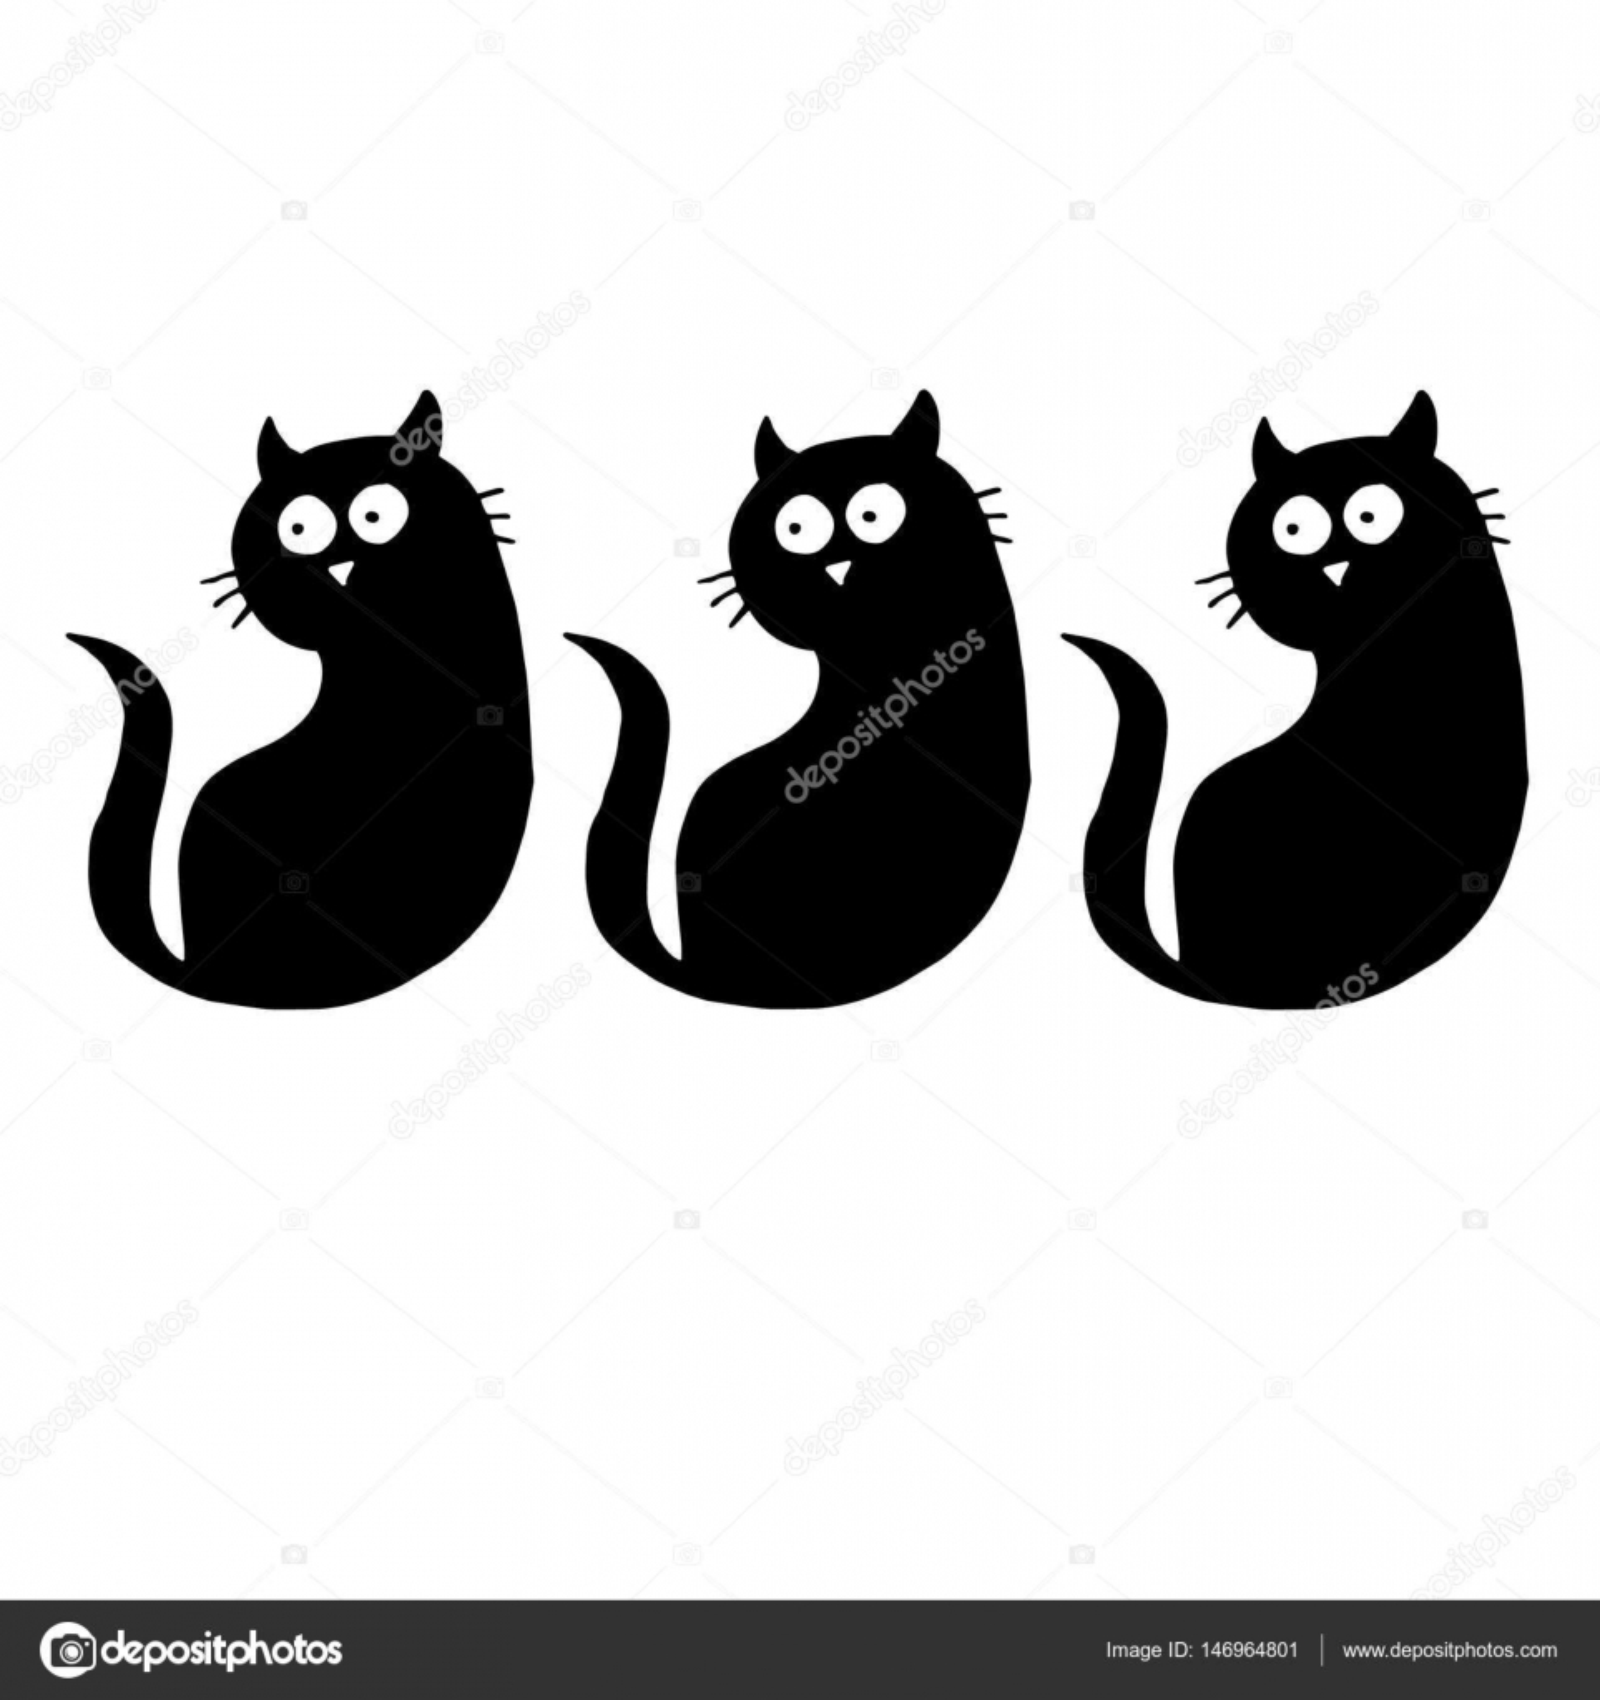 Fekete Macska Kartyajatek Ingyenes Letoltese